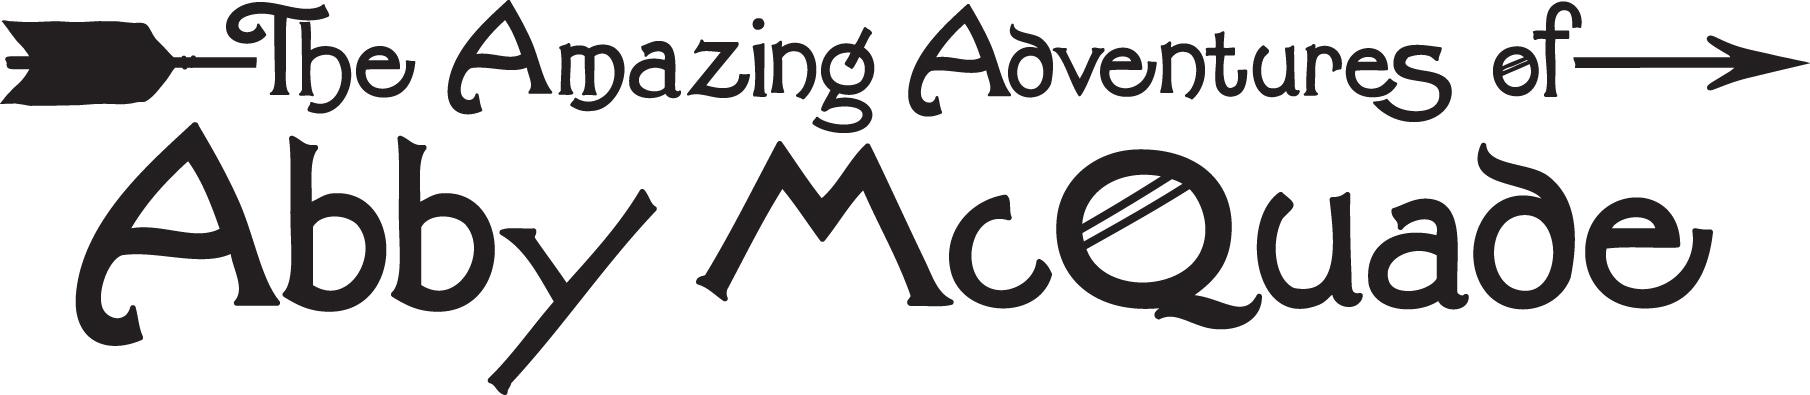 the-amazing-adventures-of-abby-mcquade-logo-bw-02.jpg